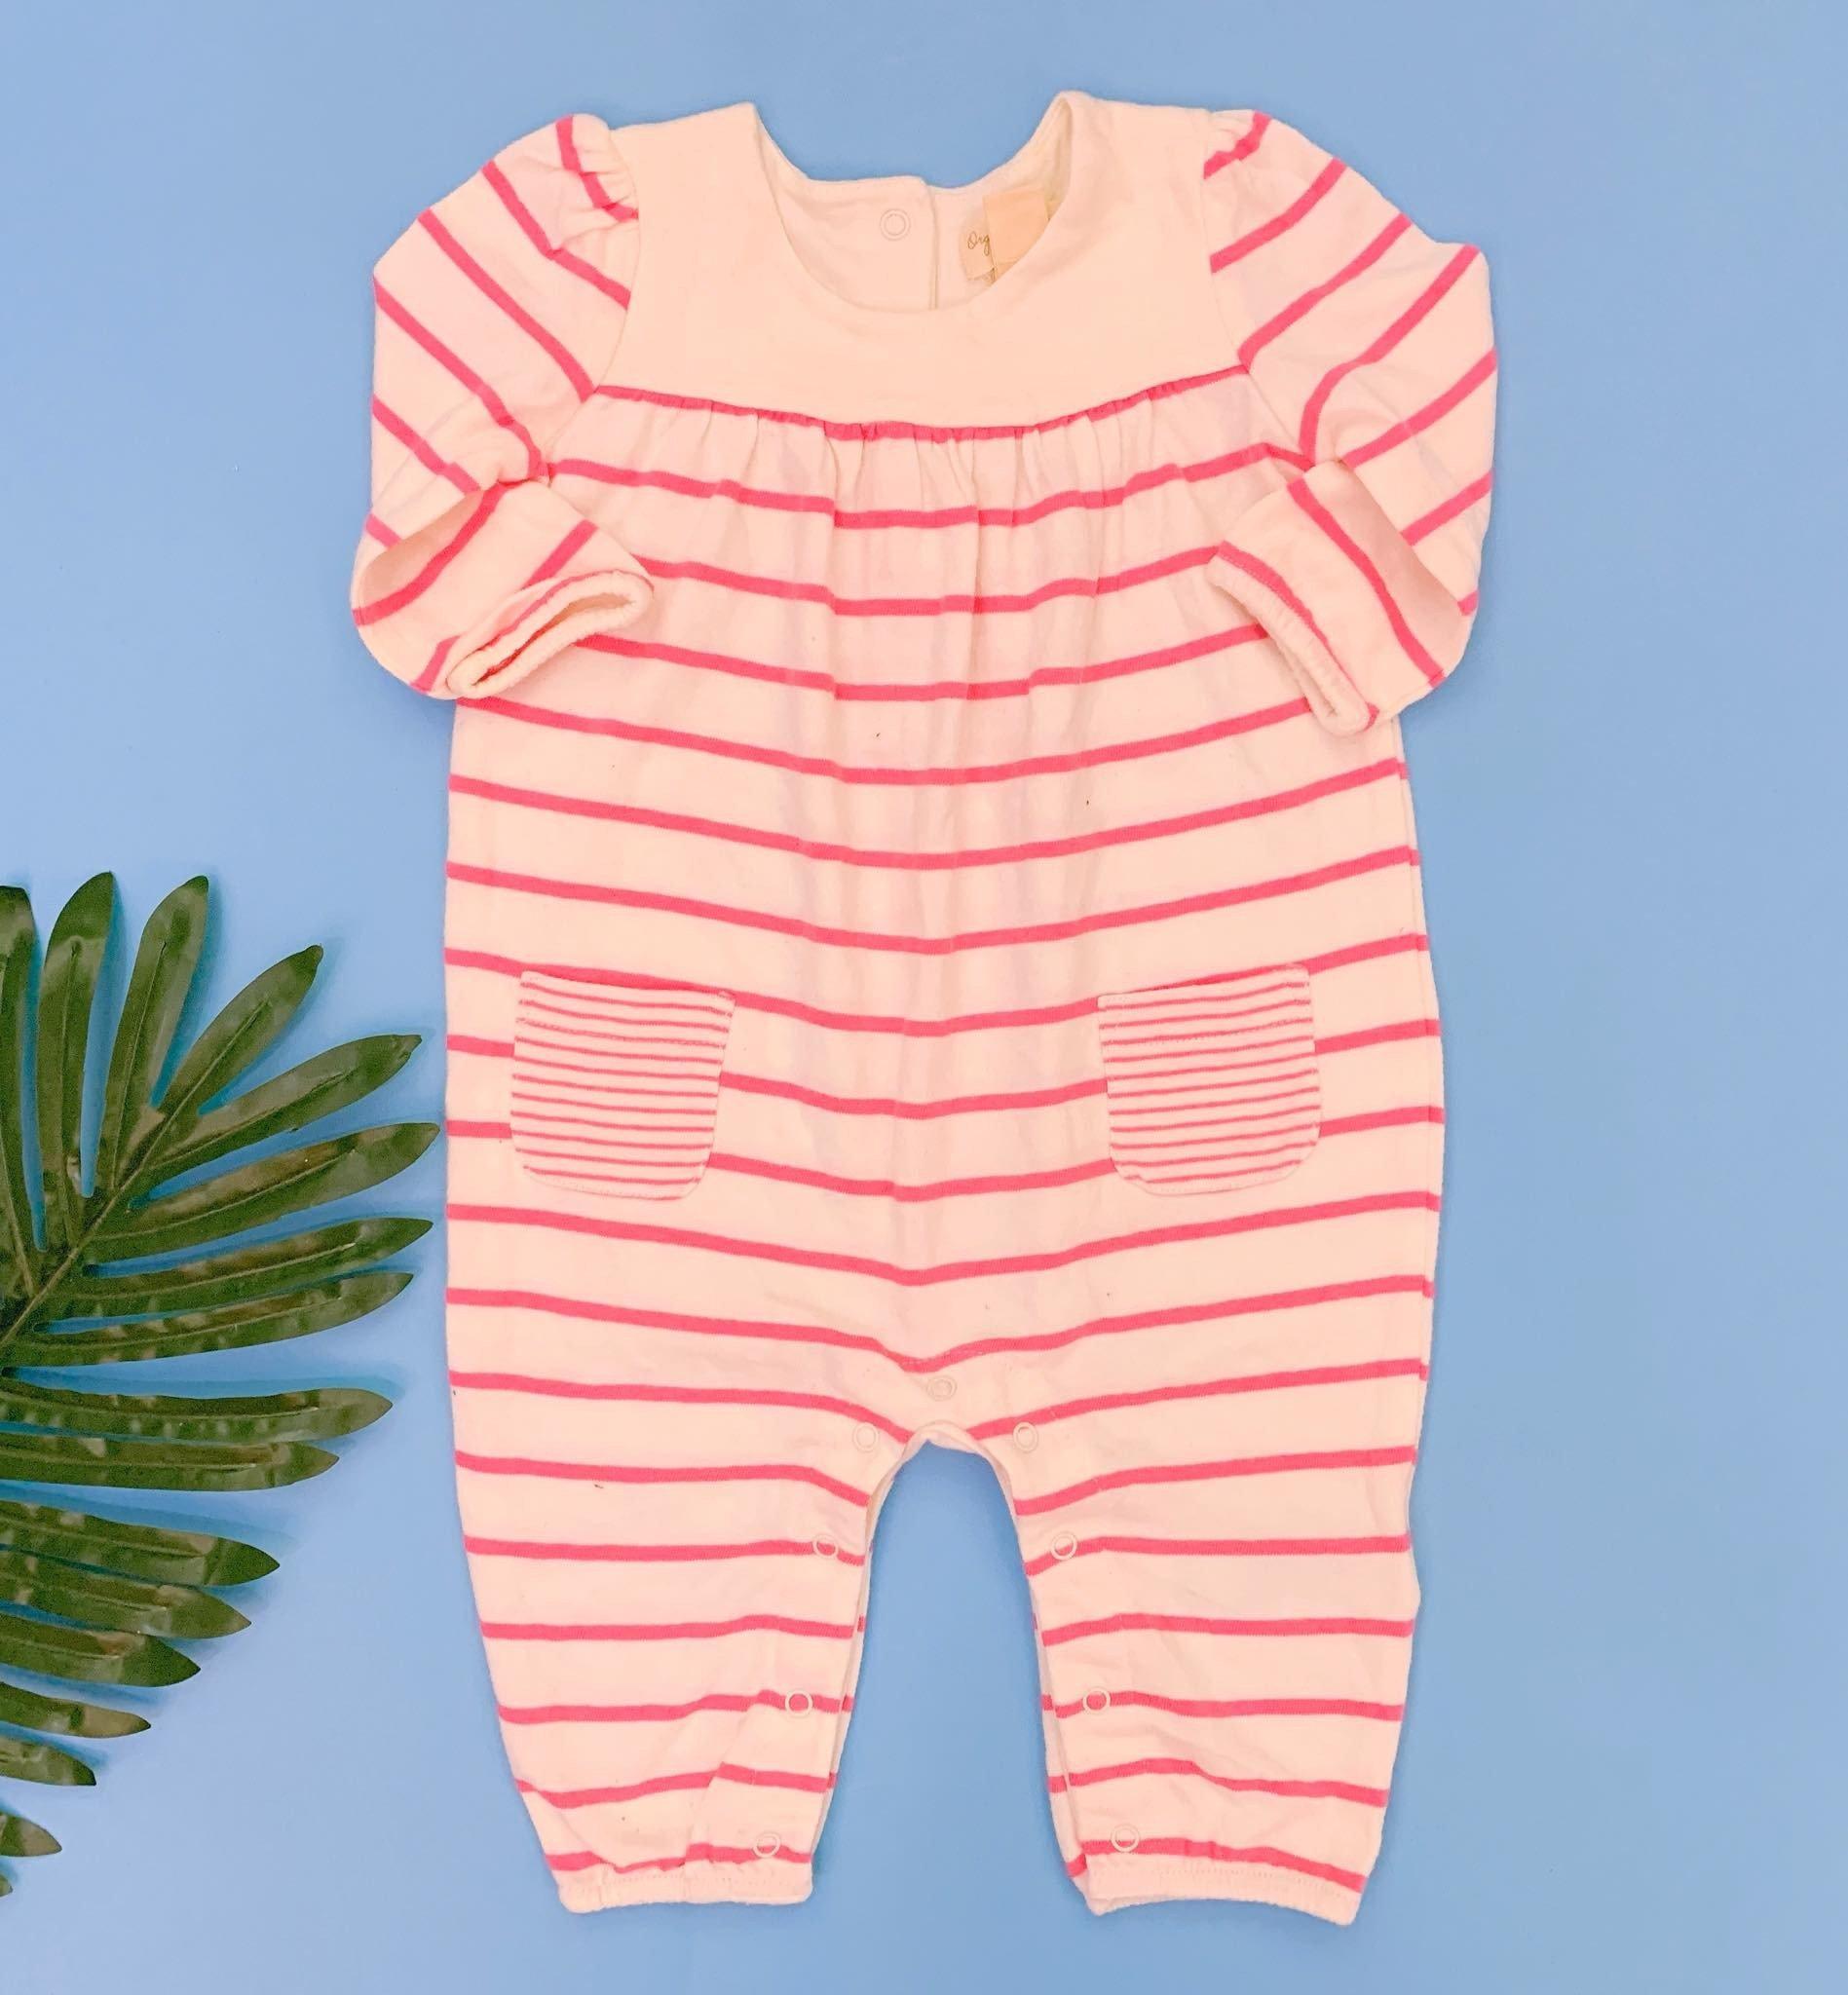 [5-10kg] Sleepsuit Baby Gap 56 [Girl] - Kem/Sọc Hồng